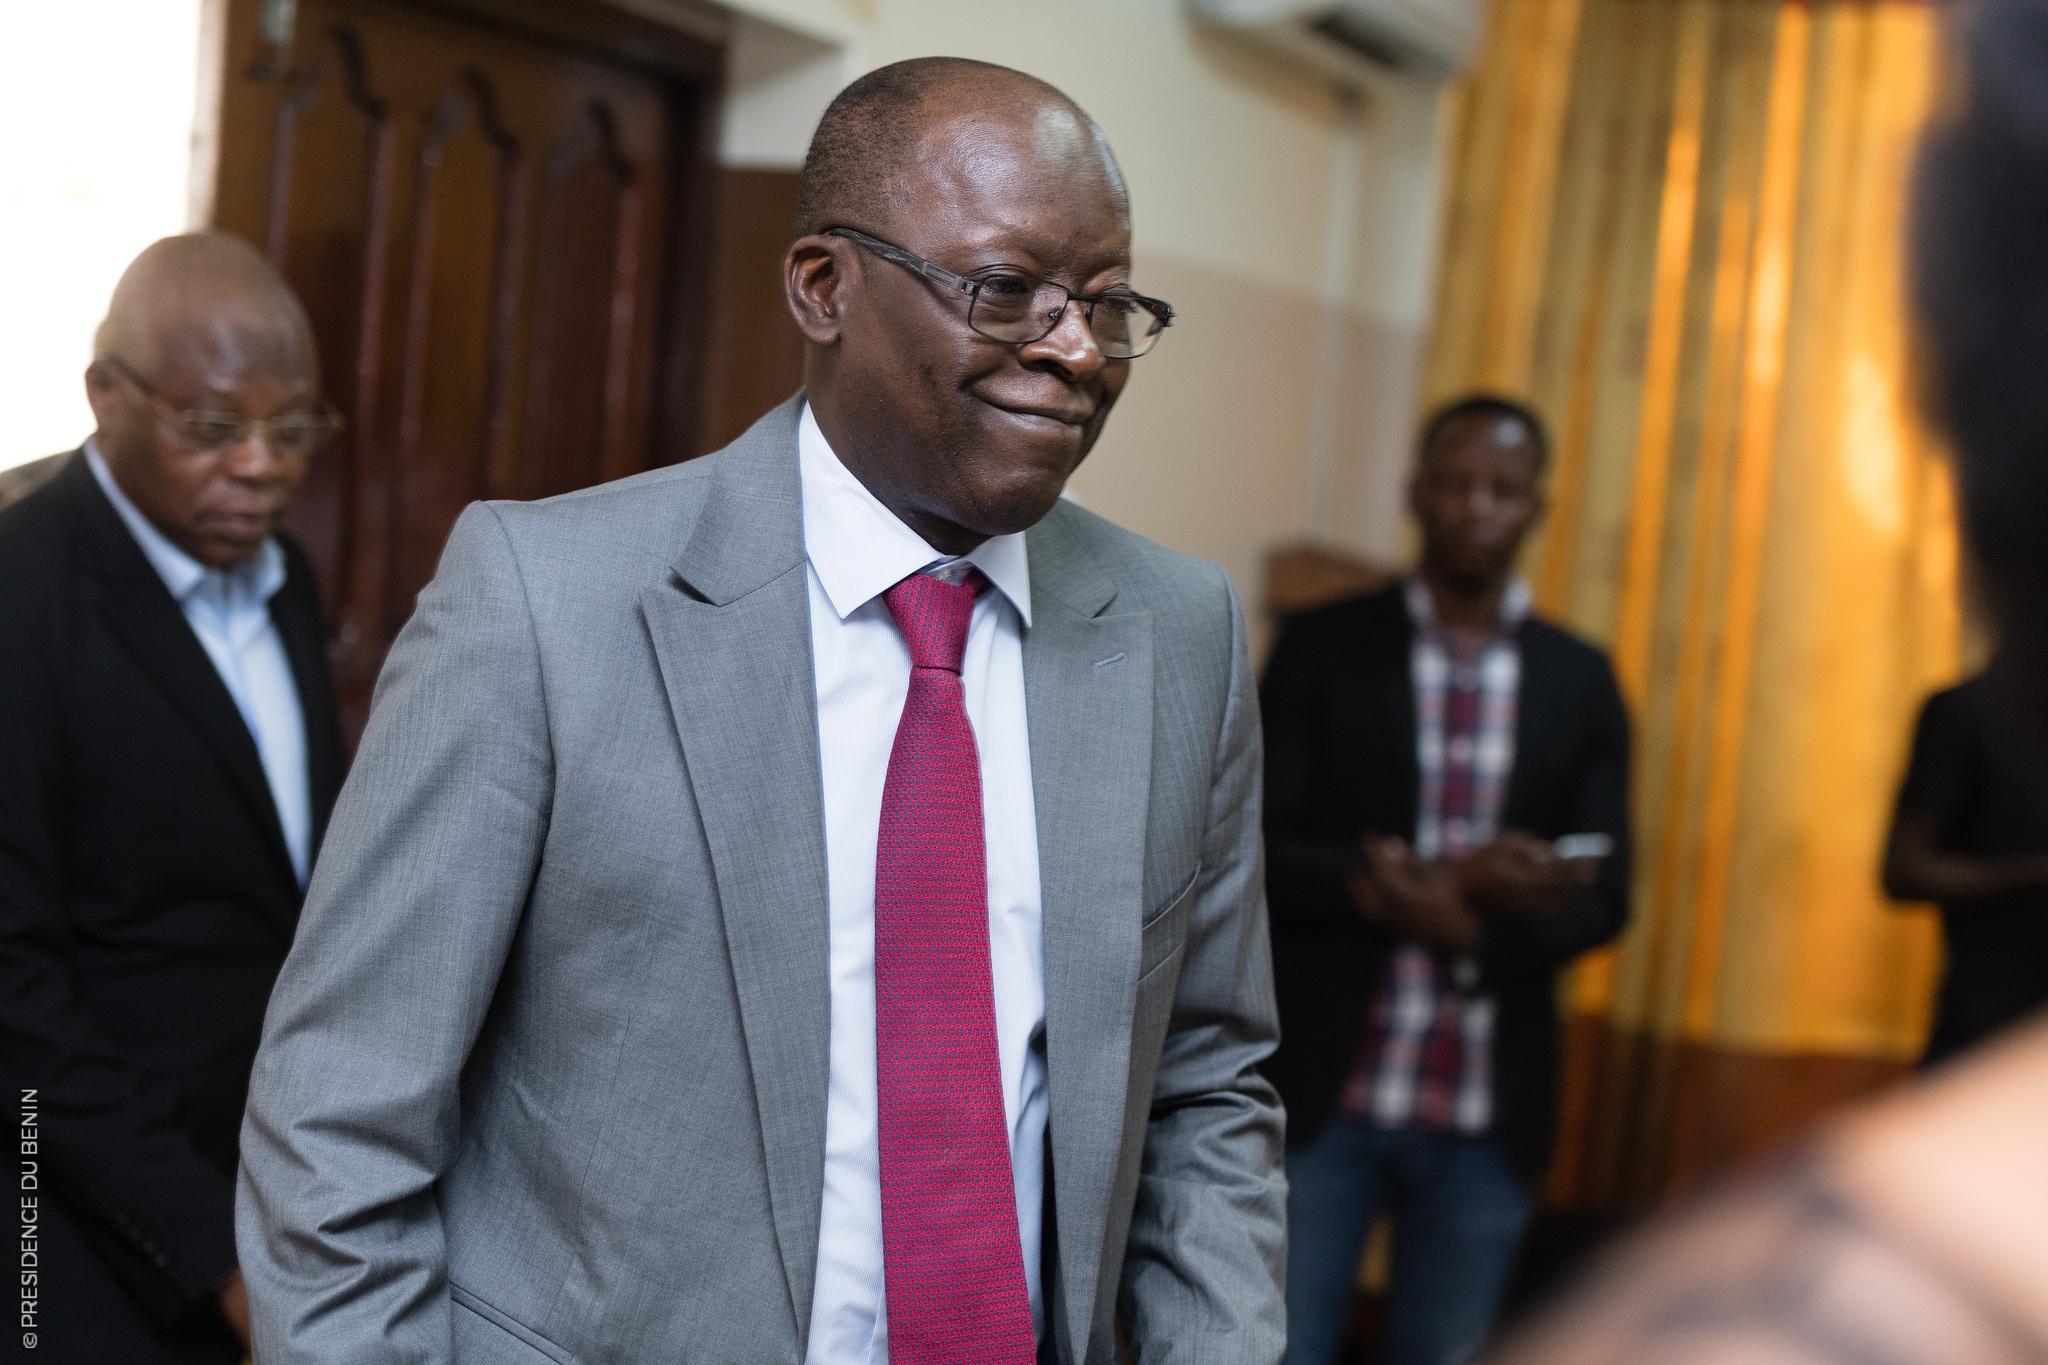 Le ministre Abdoulaye Bio Tchané | Photo : PRESIDENCE DU BENIN